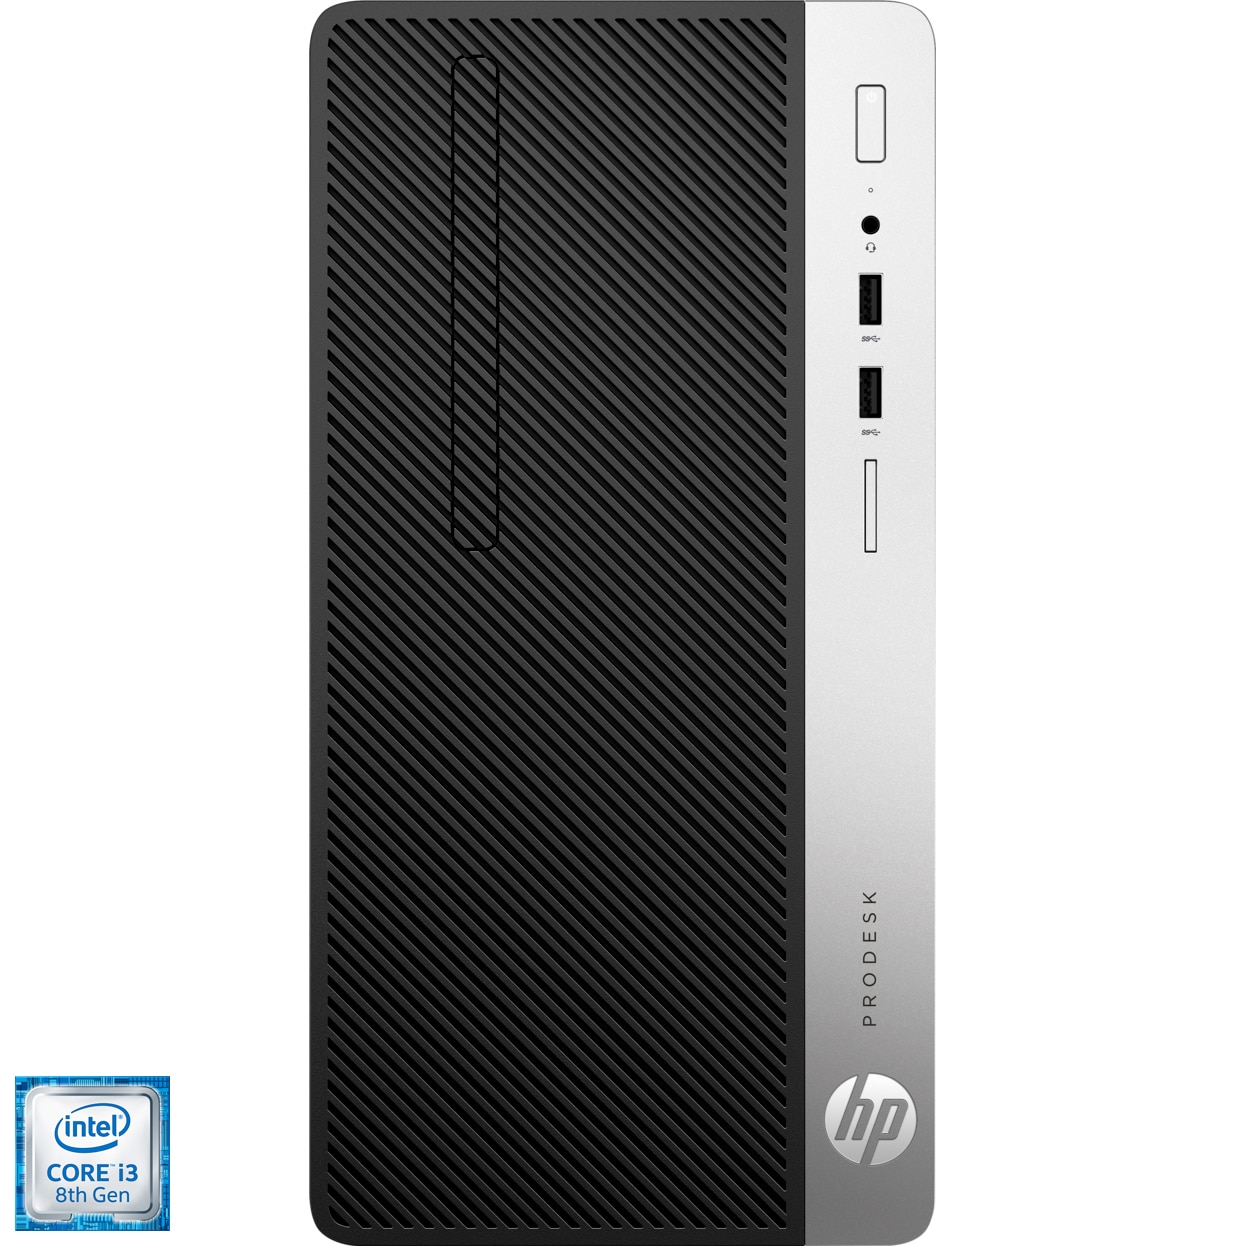 Fotografie Sistem Desktop PC HP ProDesk 400 G5 MT cu procesor Intel® Core™ i3-8100 3.60 GHz, Coffee Lake, 8GB, 1TB, DVD-RW, Intel® UHD Graphics 630, Microsoft Windows 10 Pro, Mouse + Tastatura